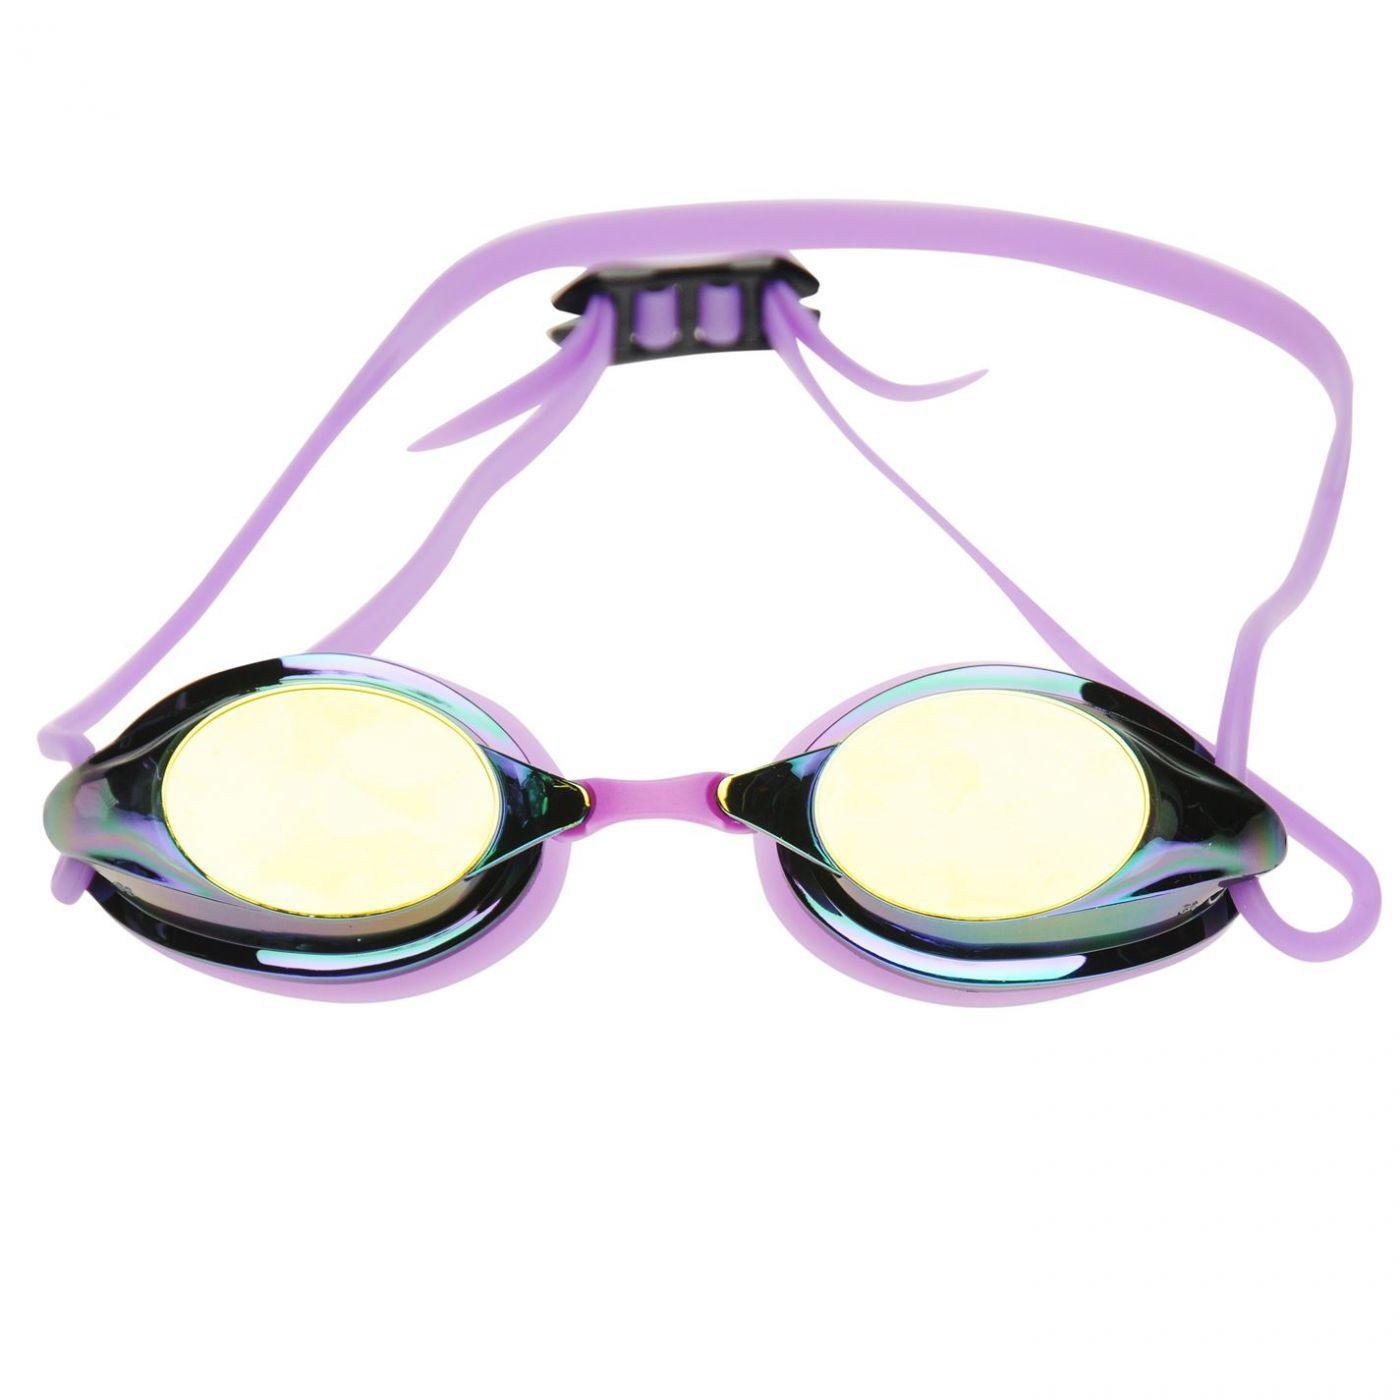 Vorgee Missile Eclipse Race Goggles